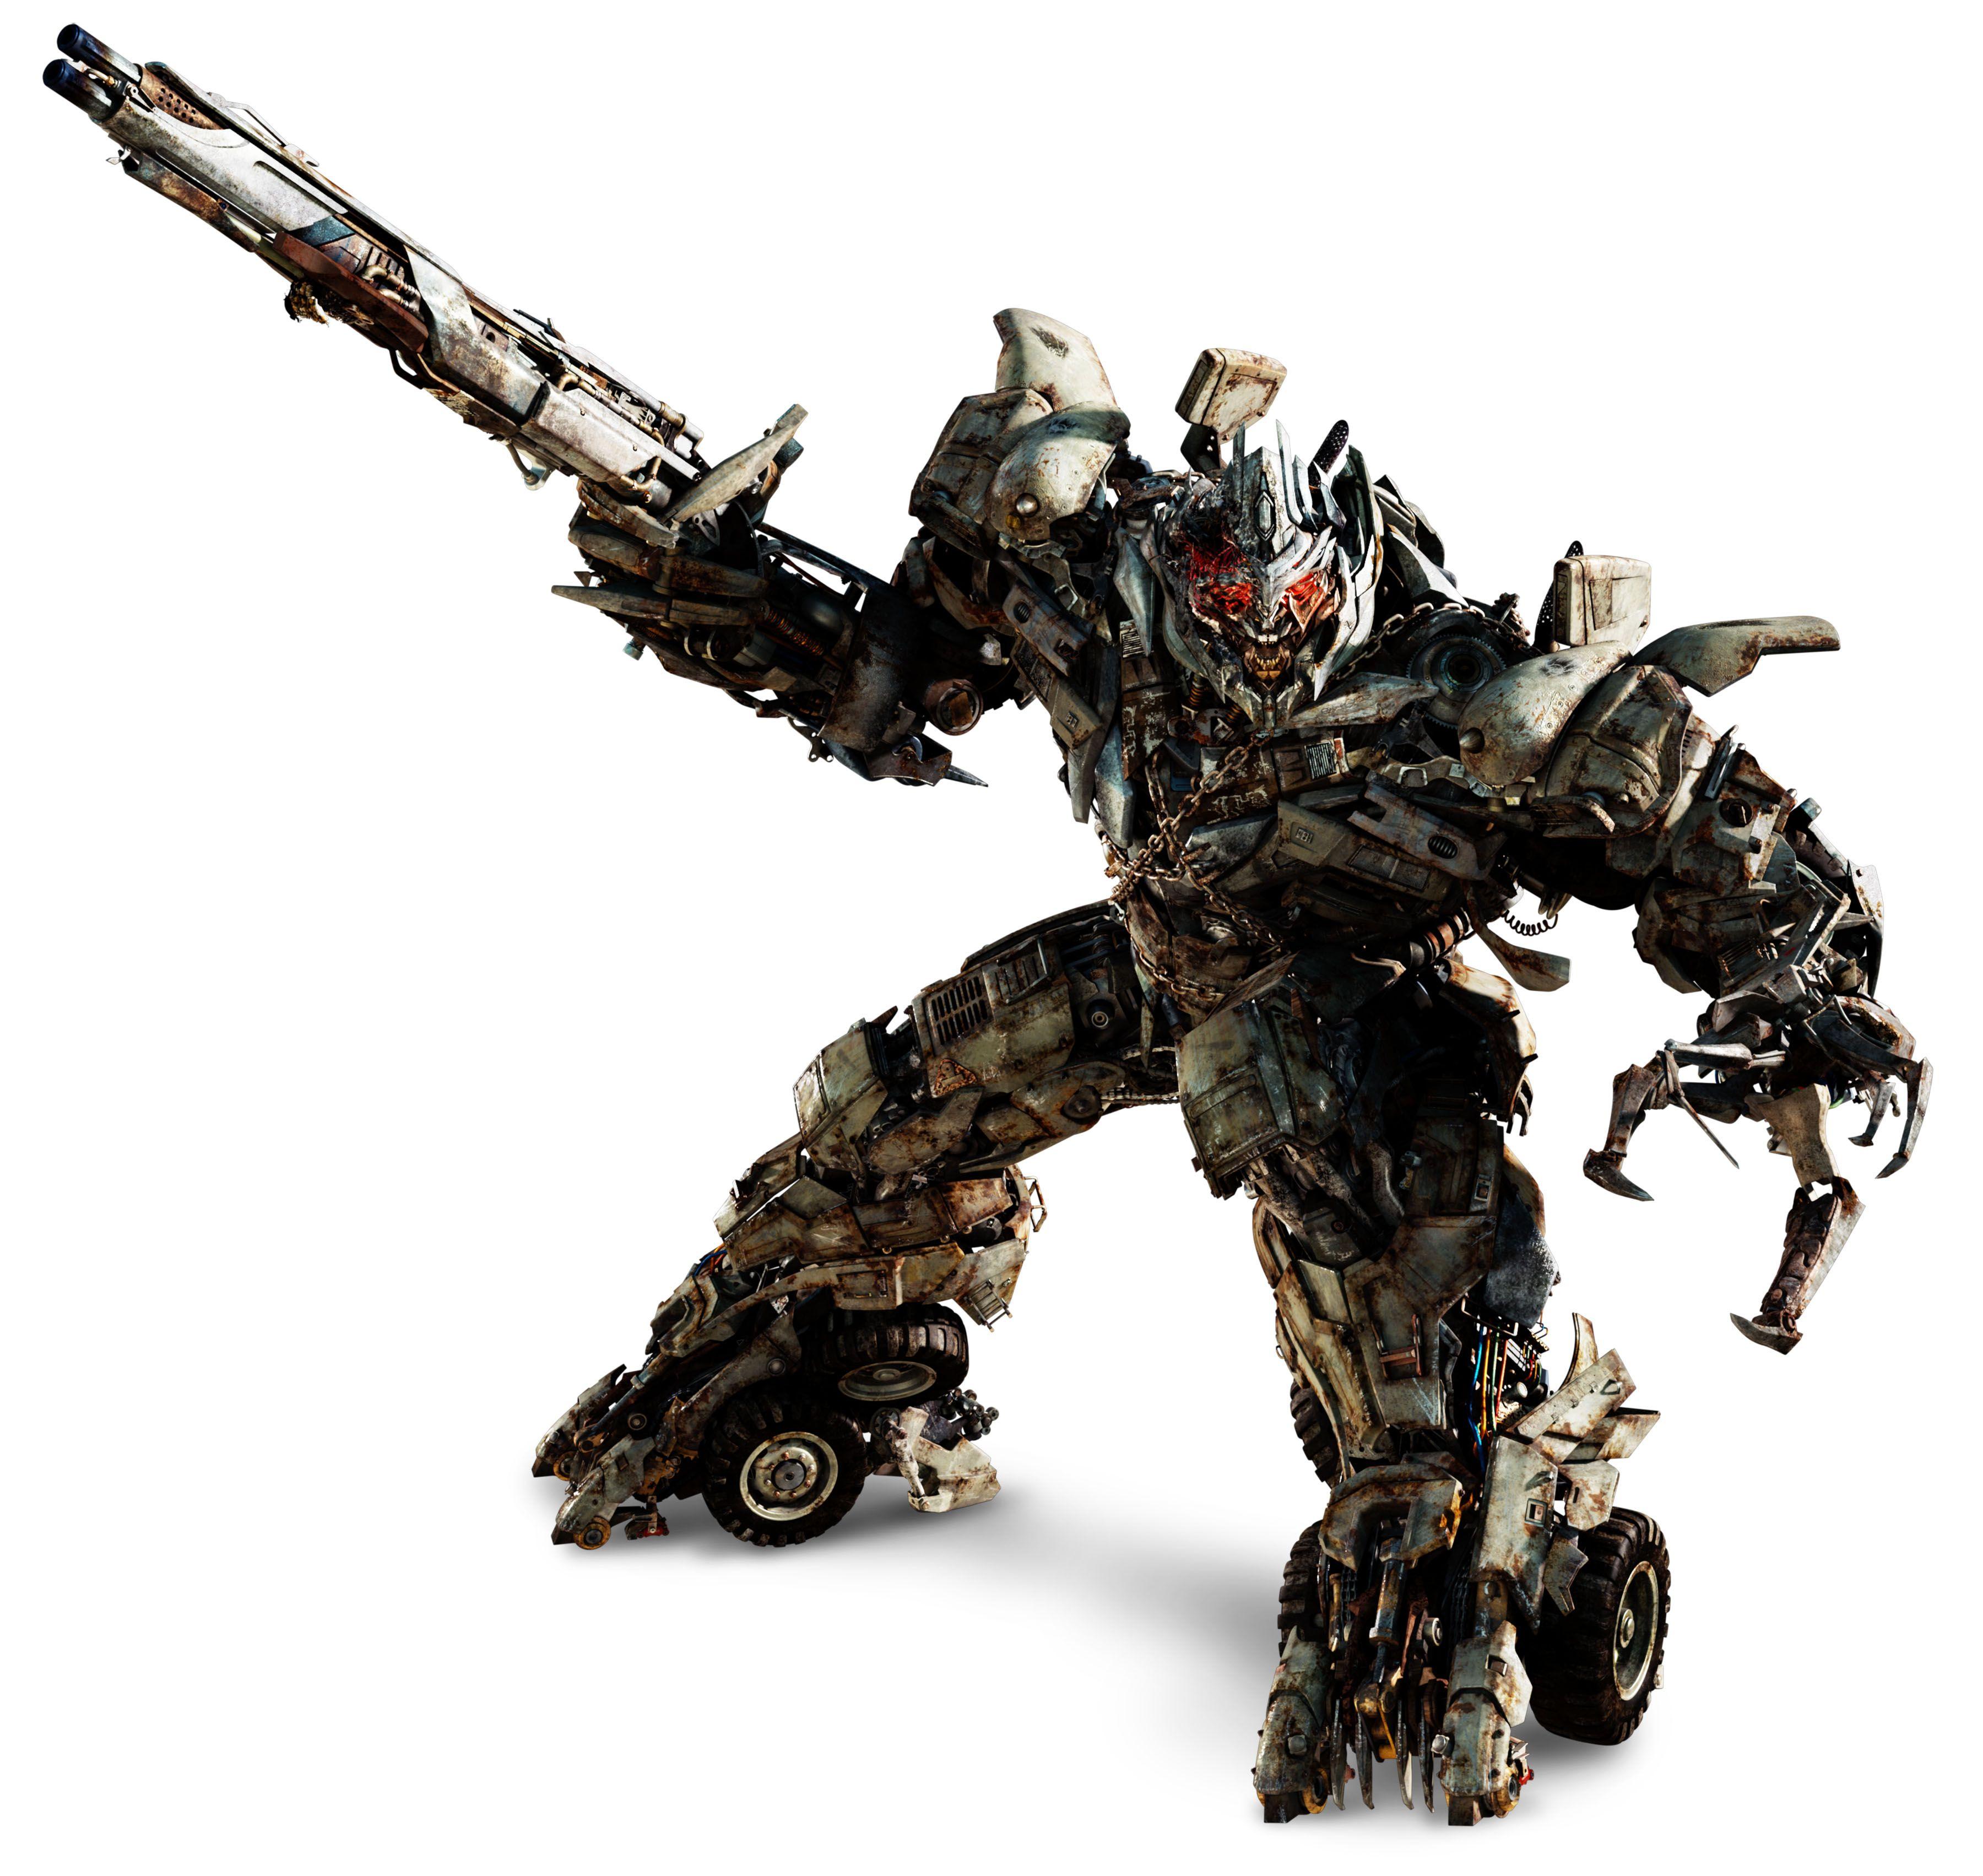 Transformers 3 Megatron Transformers Megatron Transformers